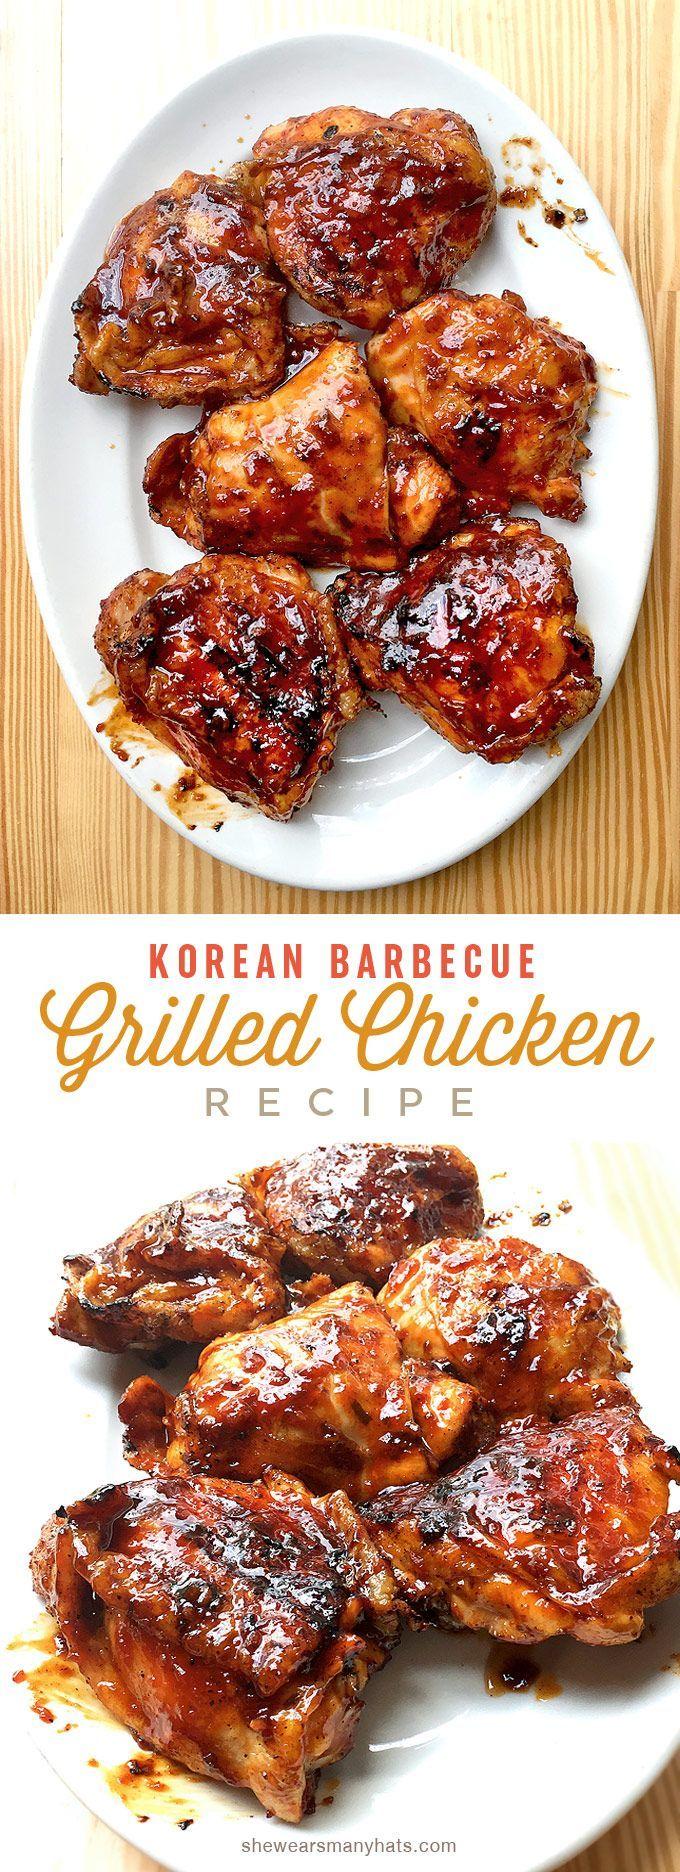 Korean BBQ Chicken Recipe | shewearsmanyhats.com